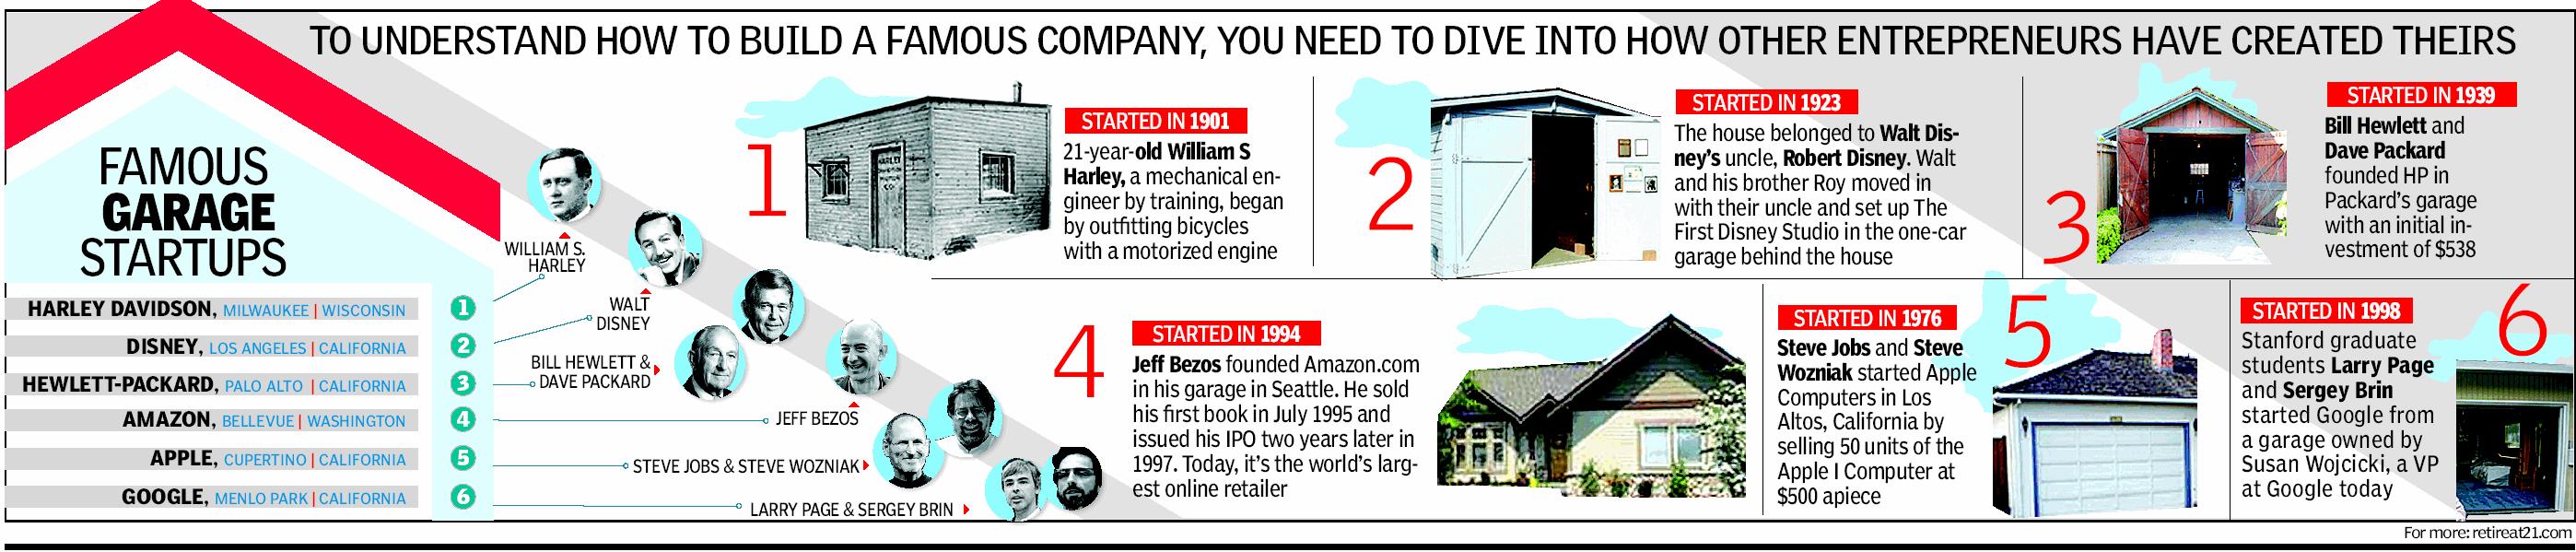 Famous garage startups! Start up, Understanding, Famous